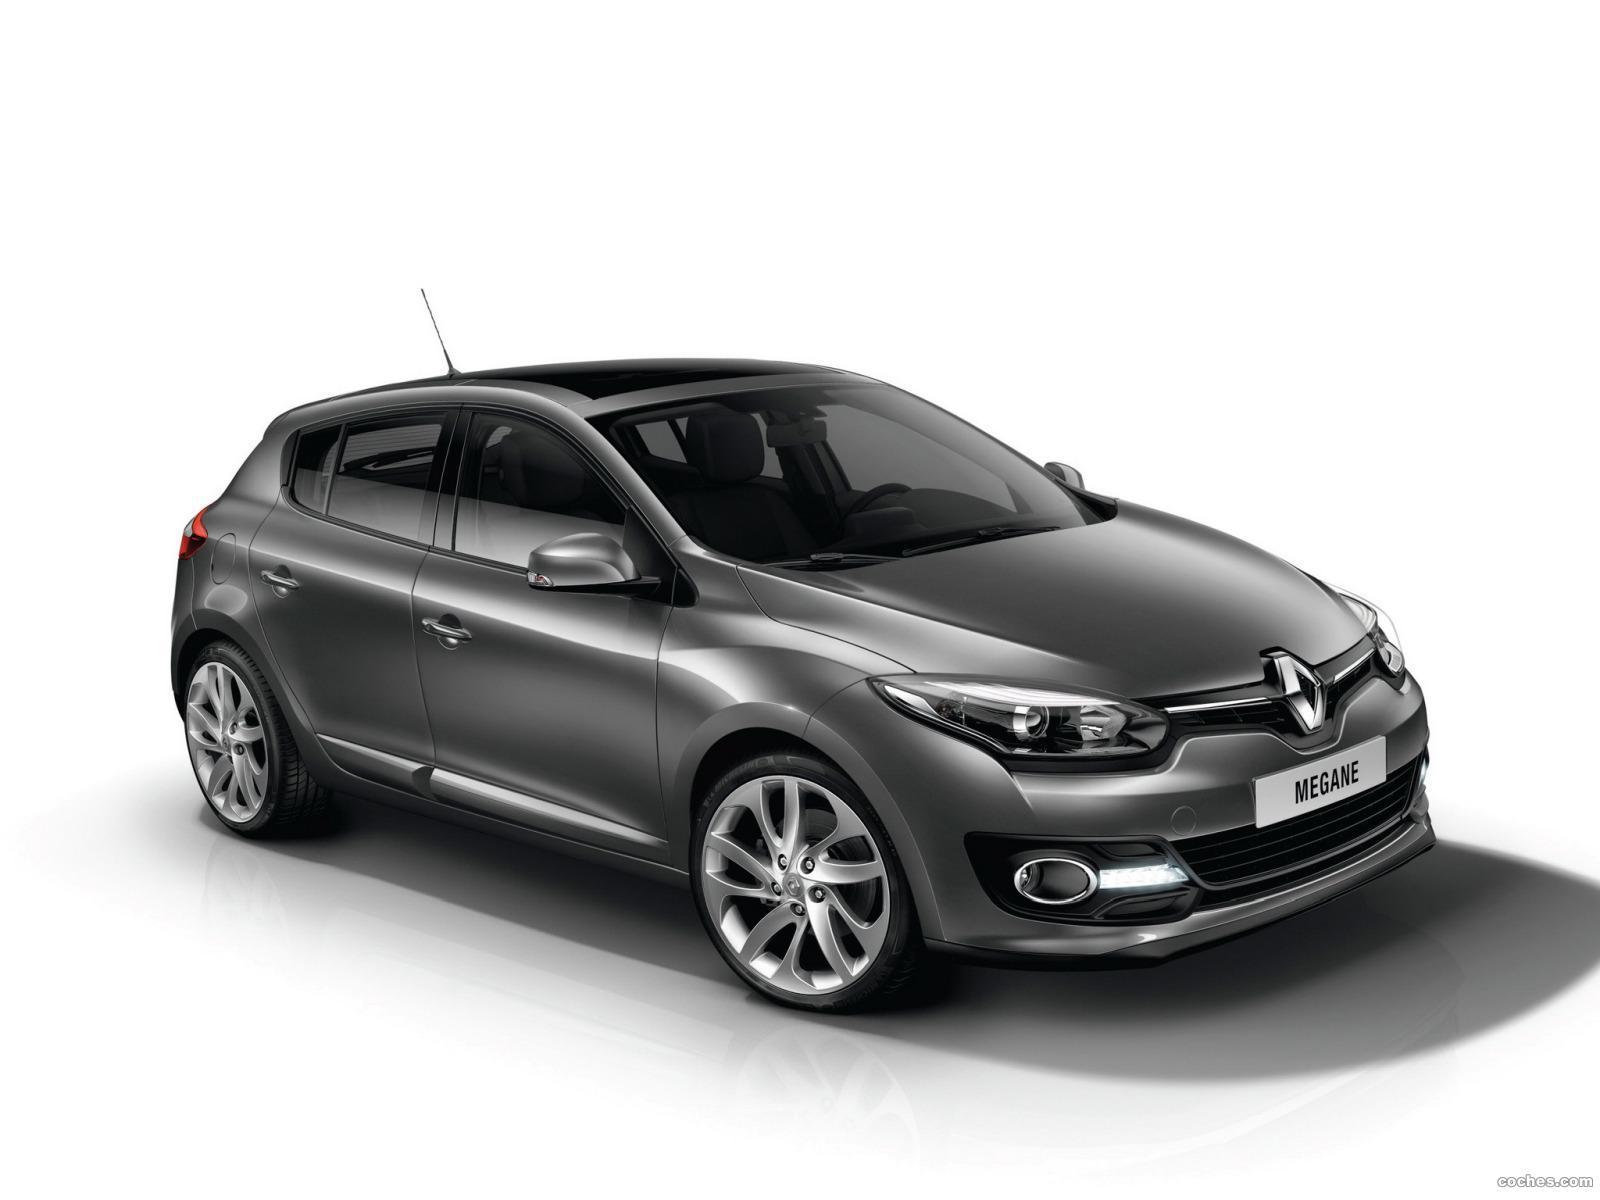 Foto 0 de Renault Megane 5 puertas 2014